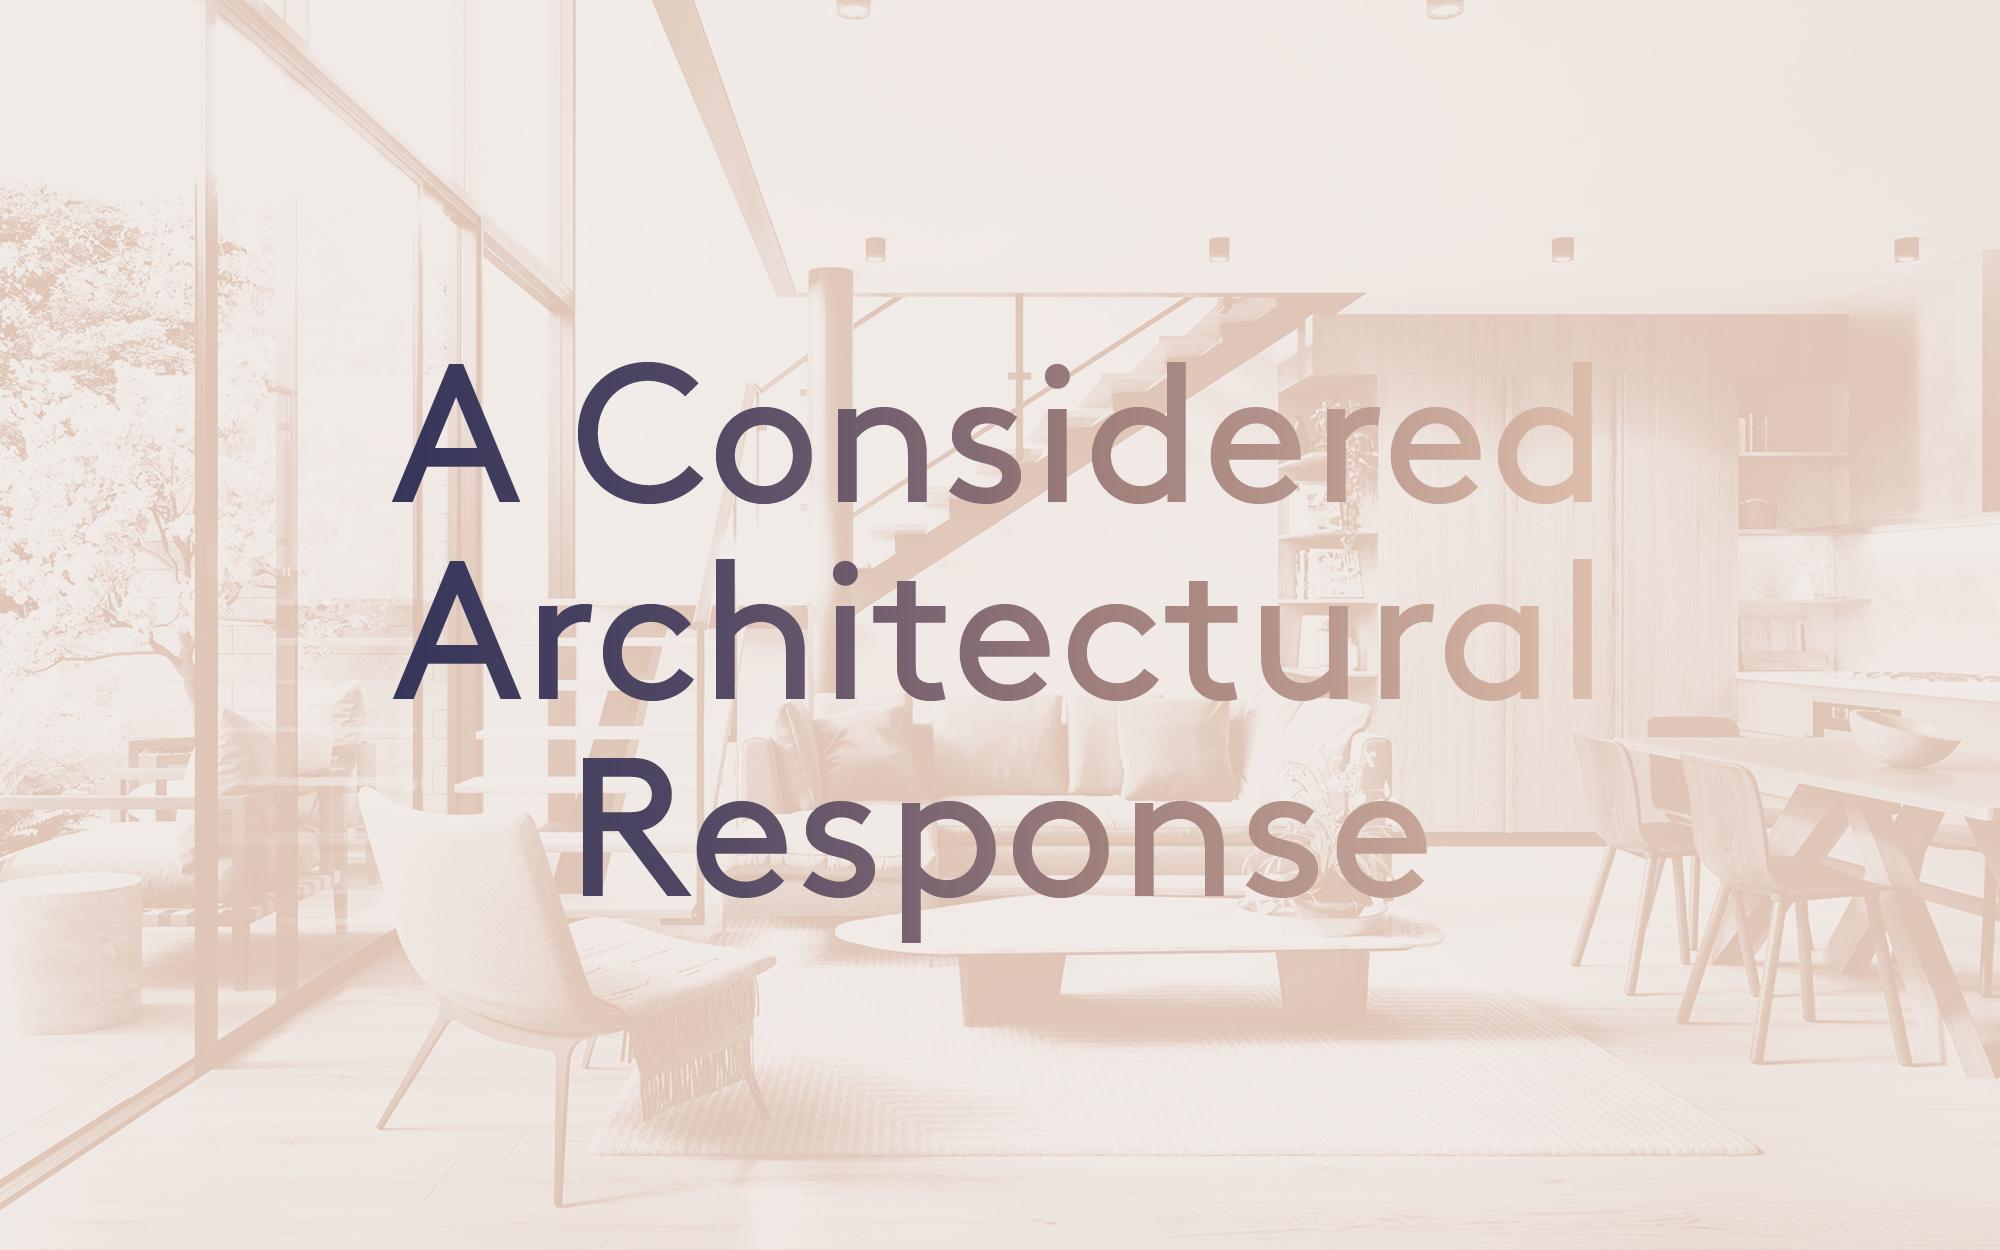 architectural_response.jpg